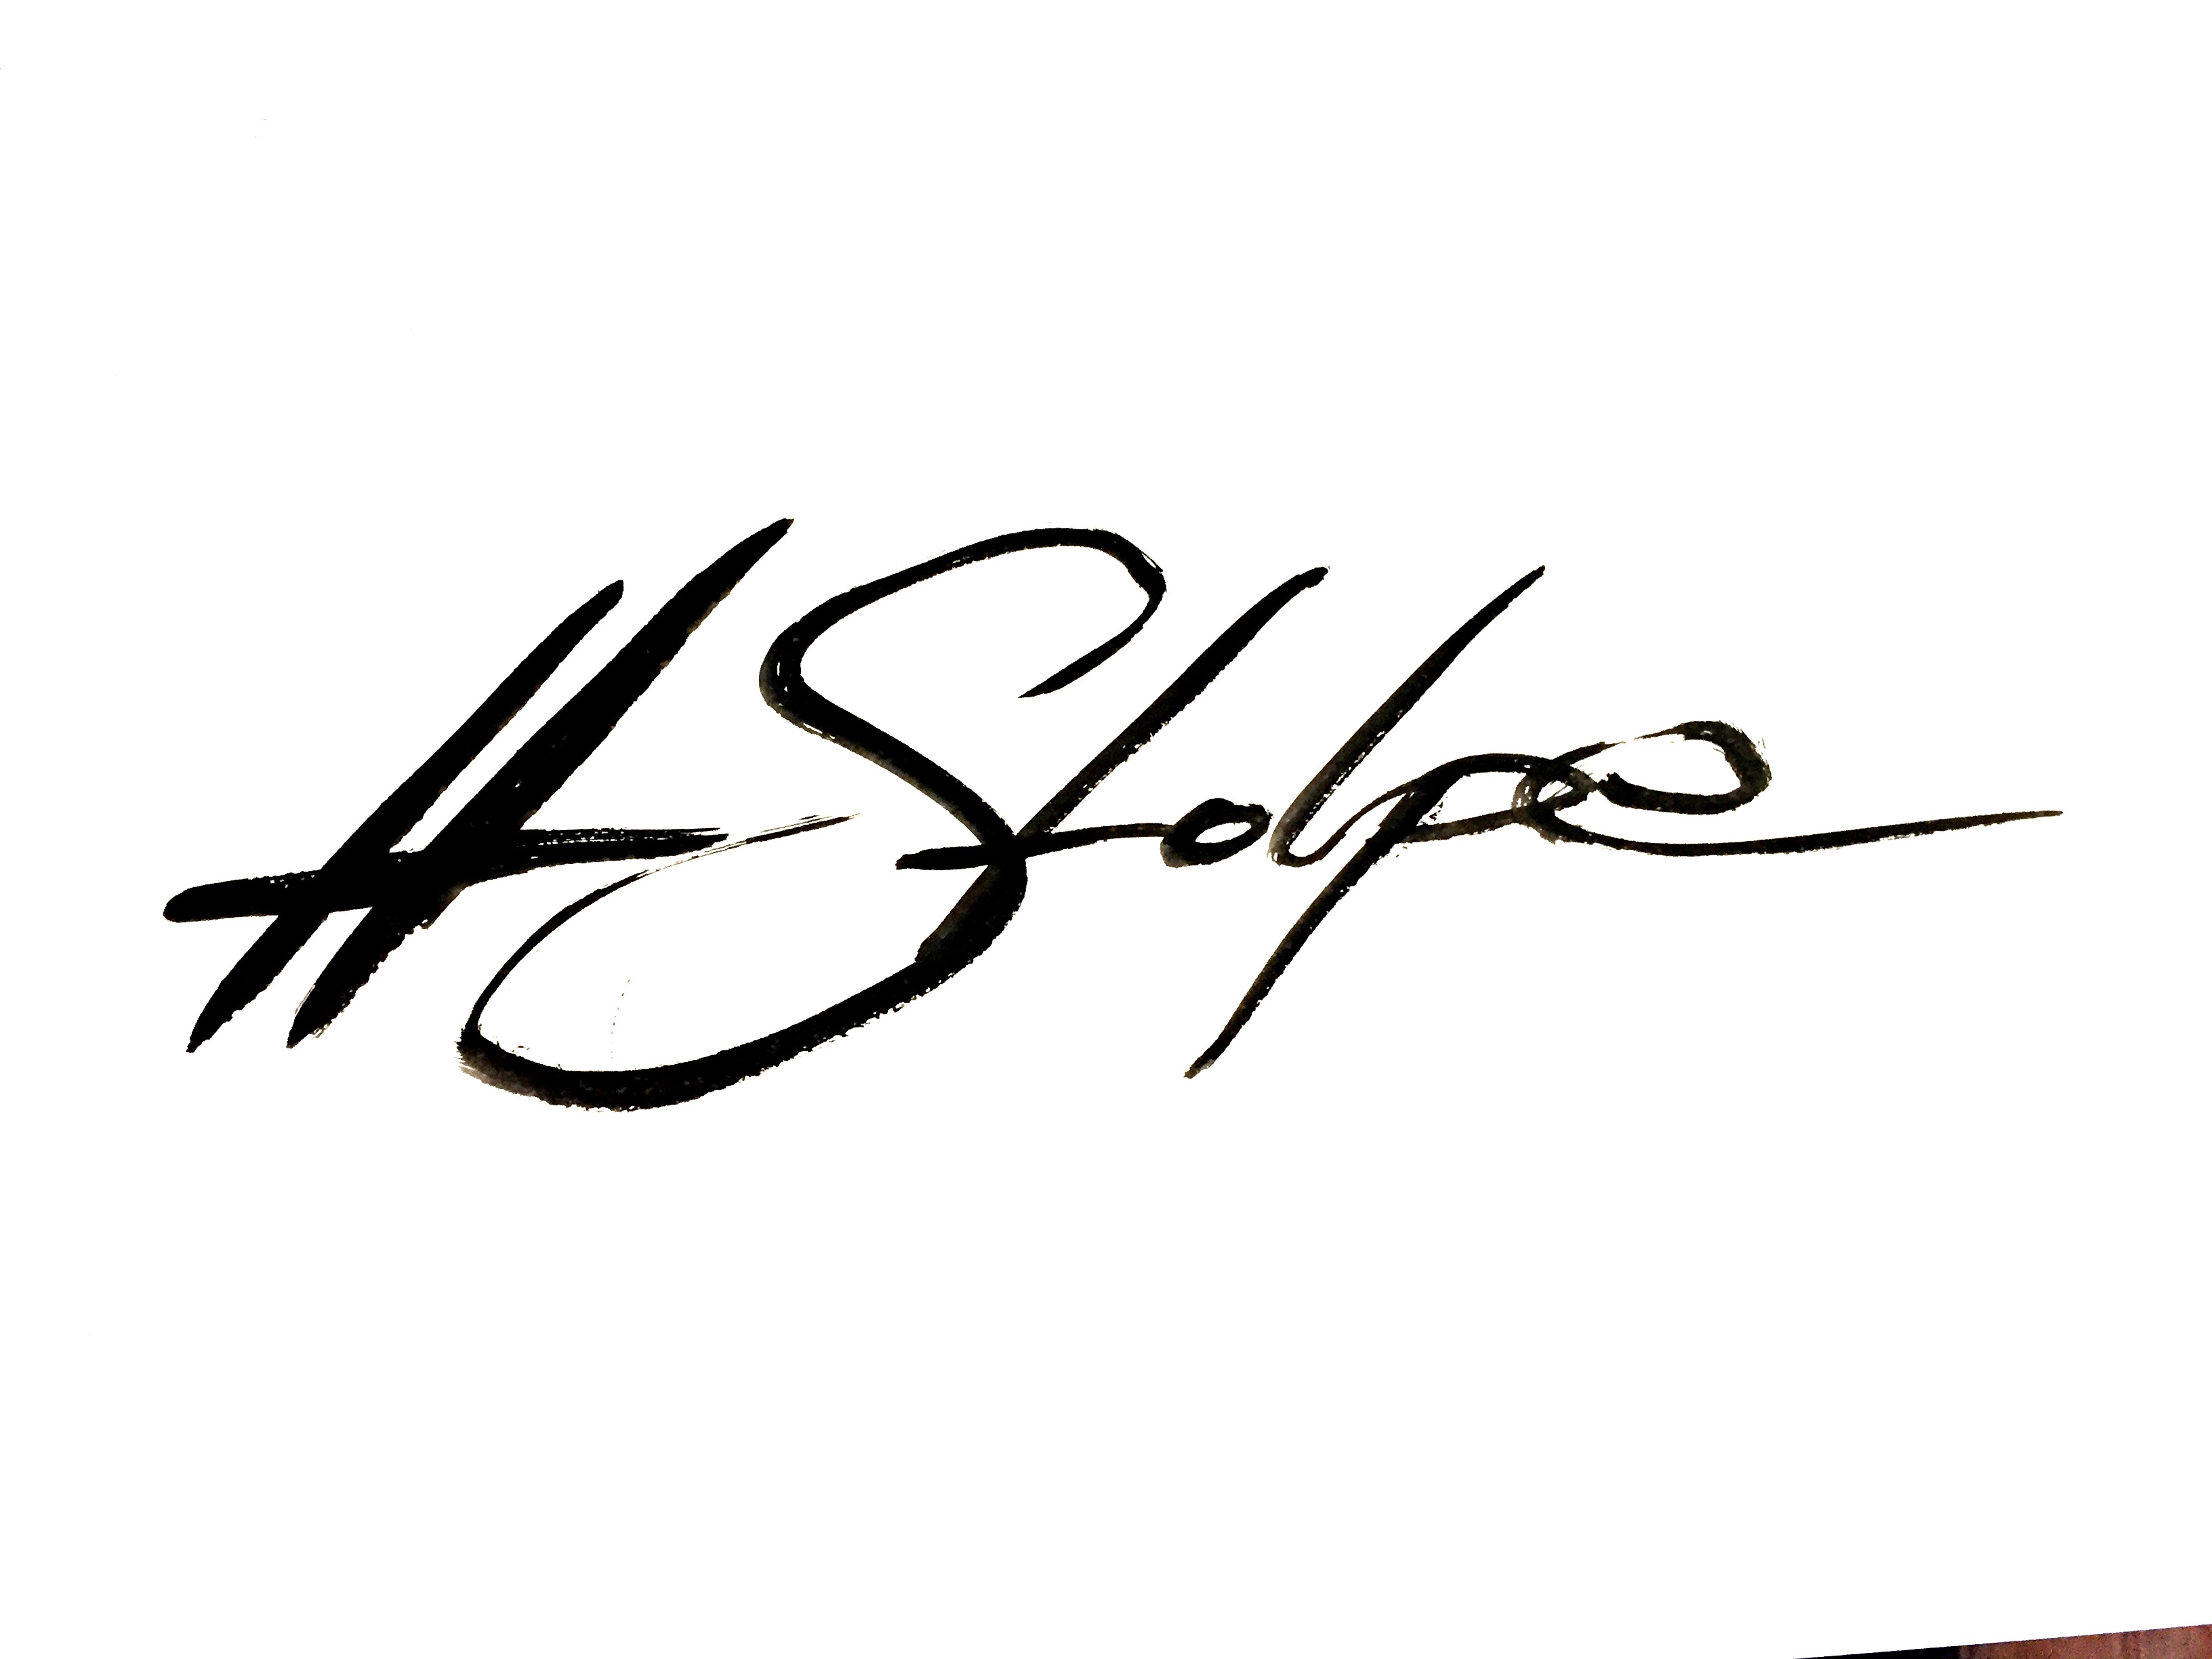 hanna.stolpe's Signature